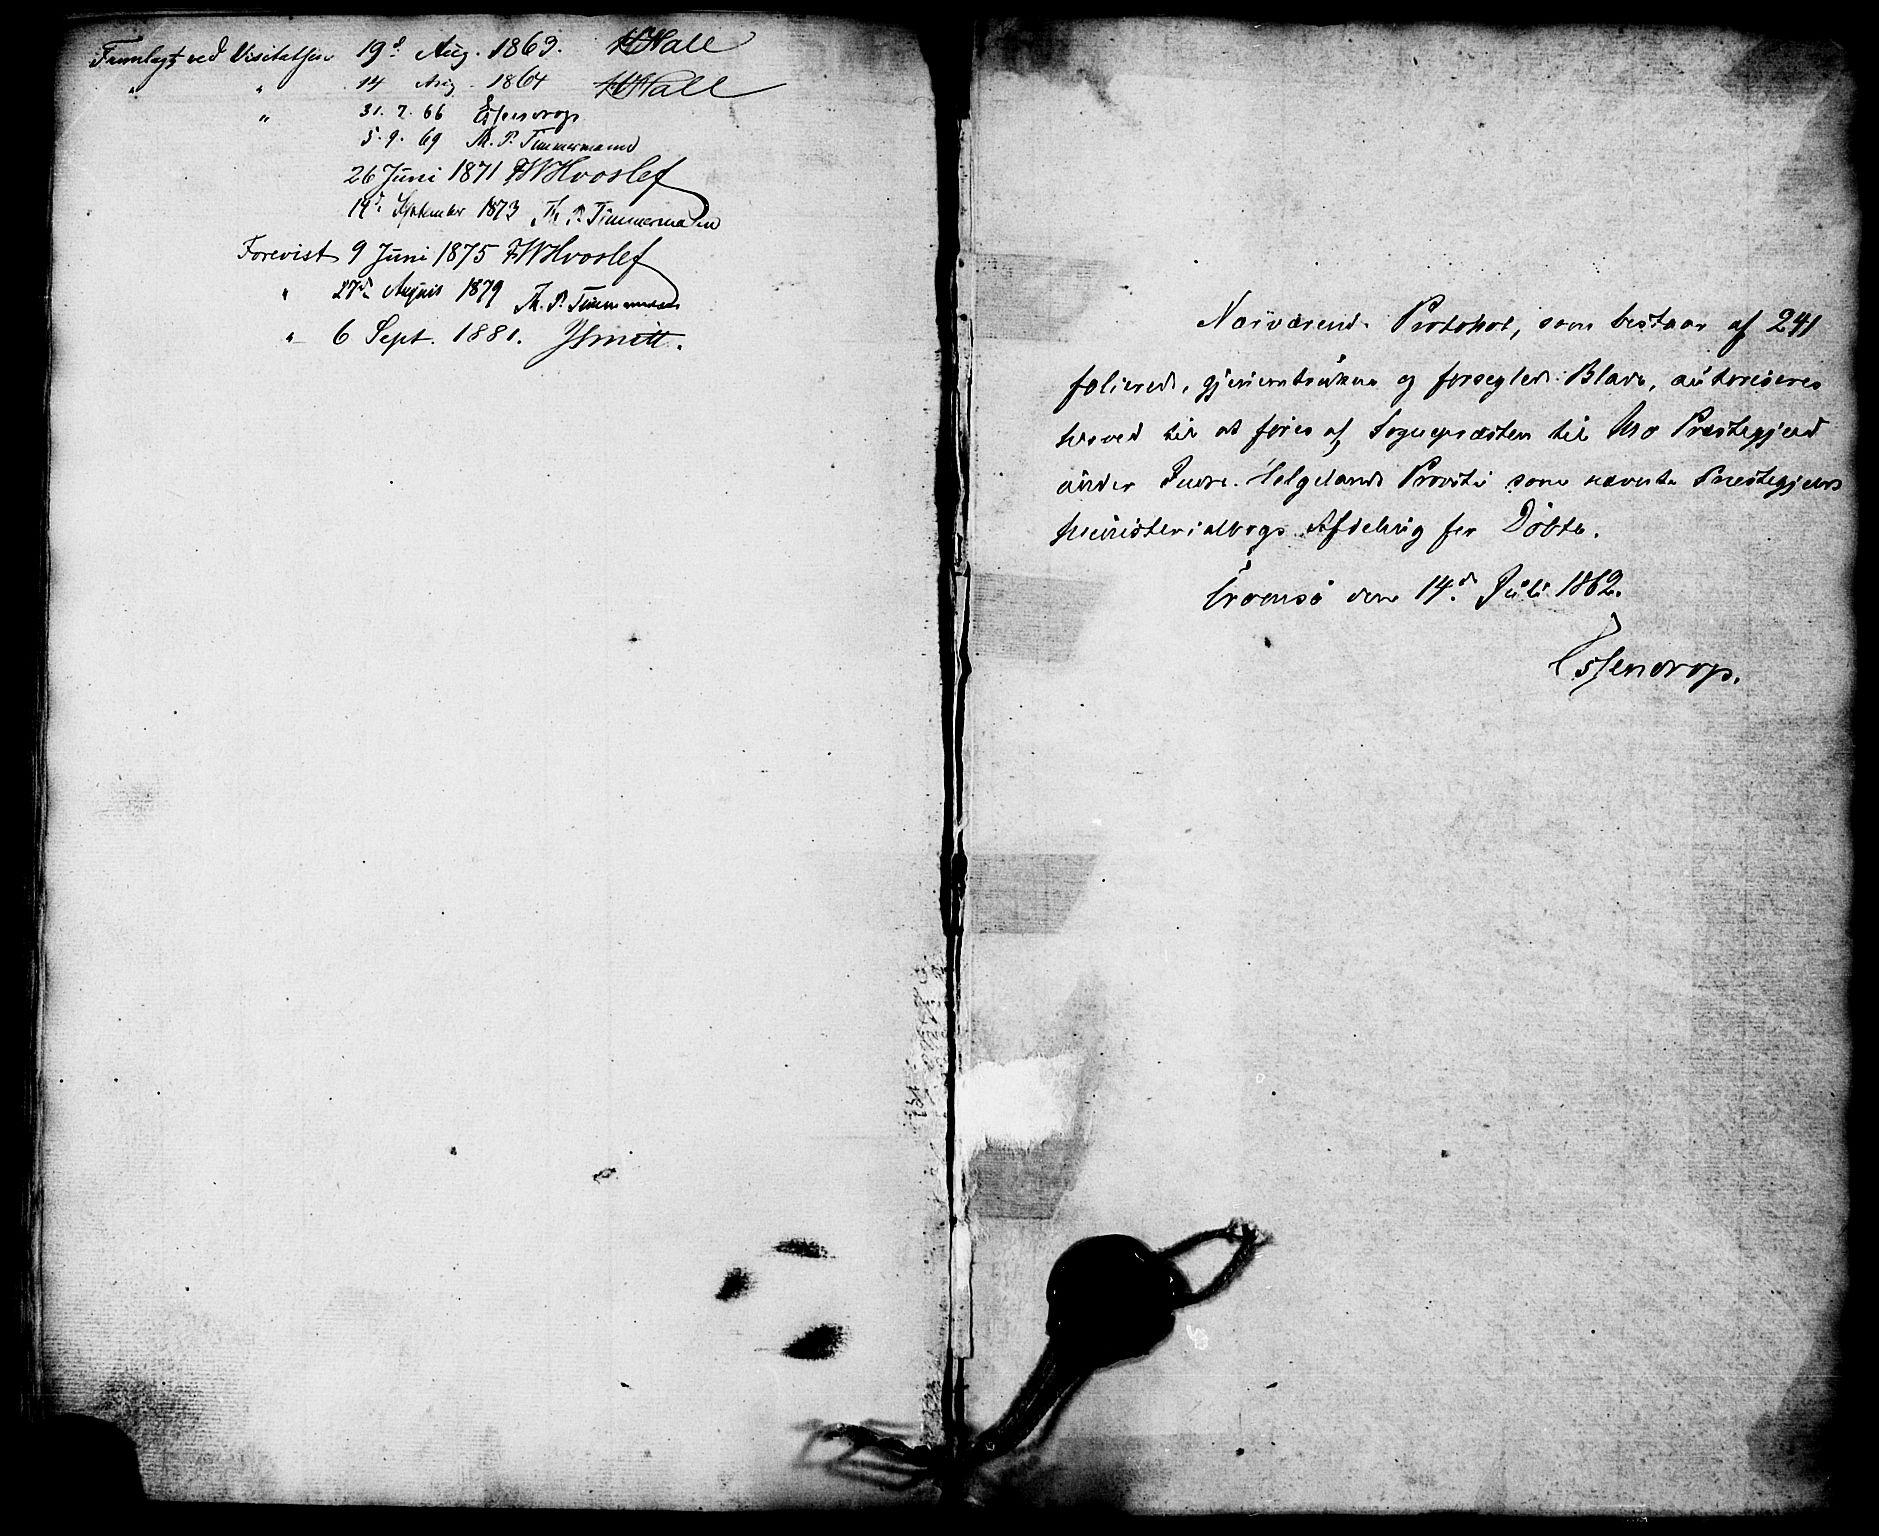 SAT, Ministerialprotokoller, klokkerbøker og fødselsregistre - Nordland, 827/L0393: Ministerialbok nr. 827A05, 1863-1883